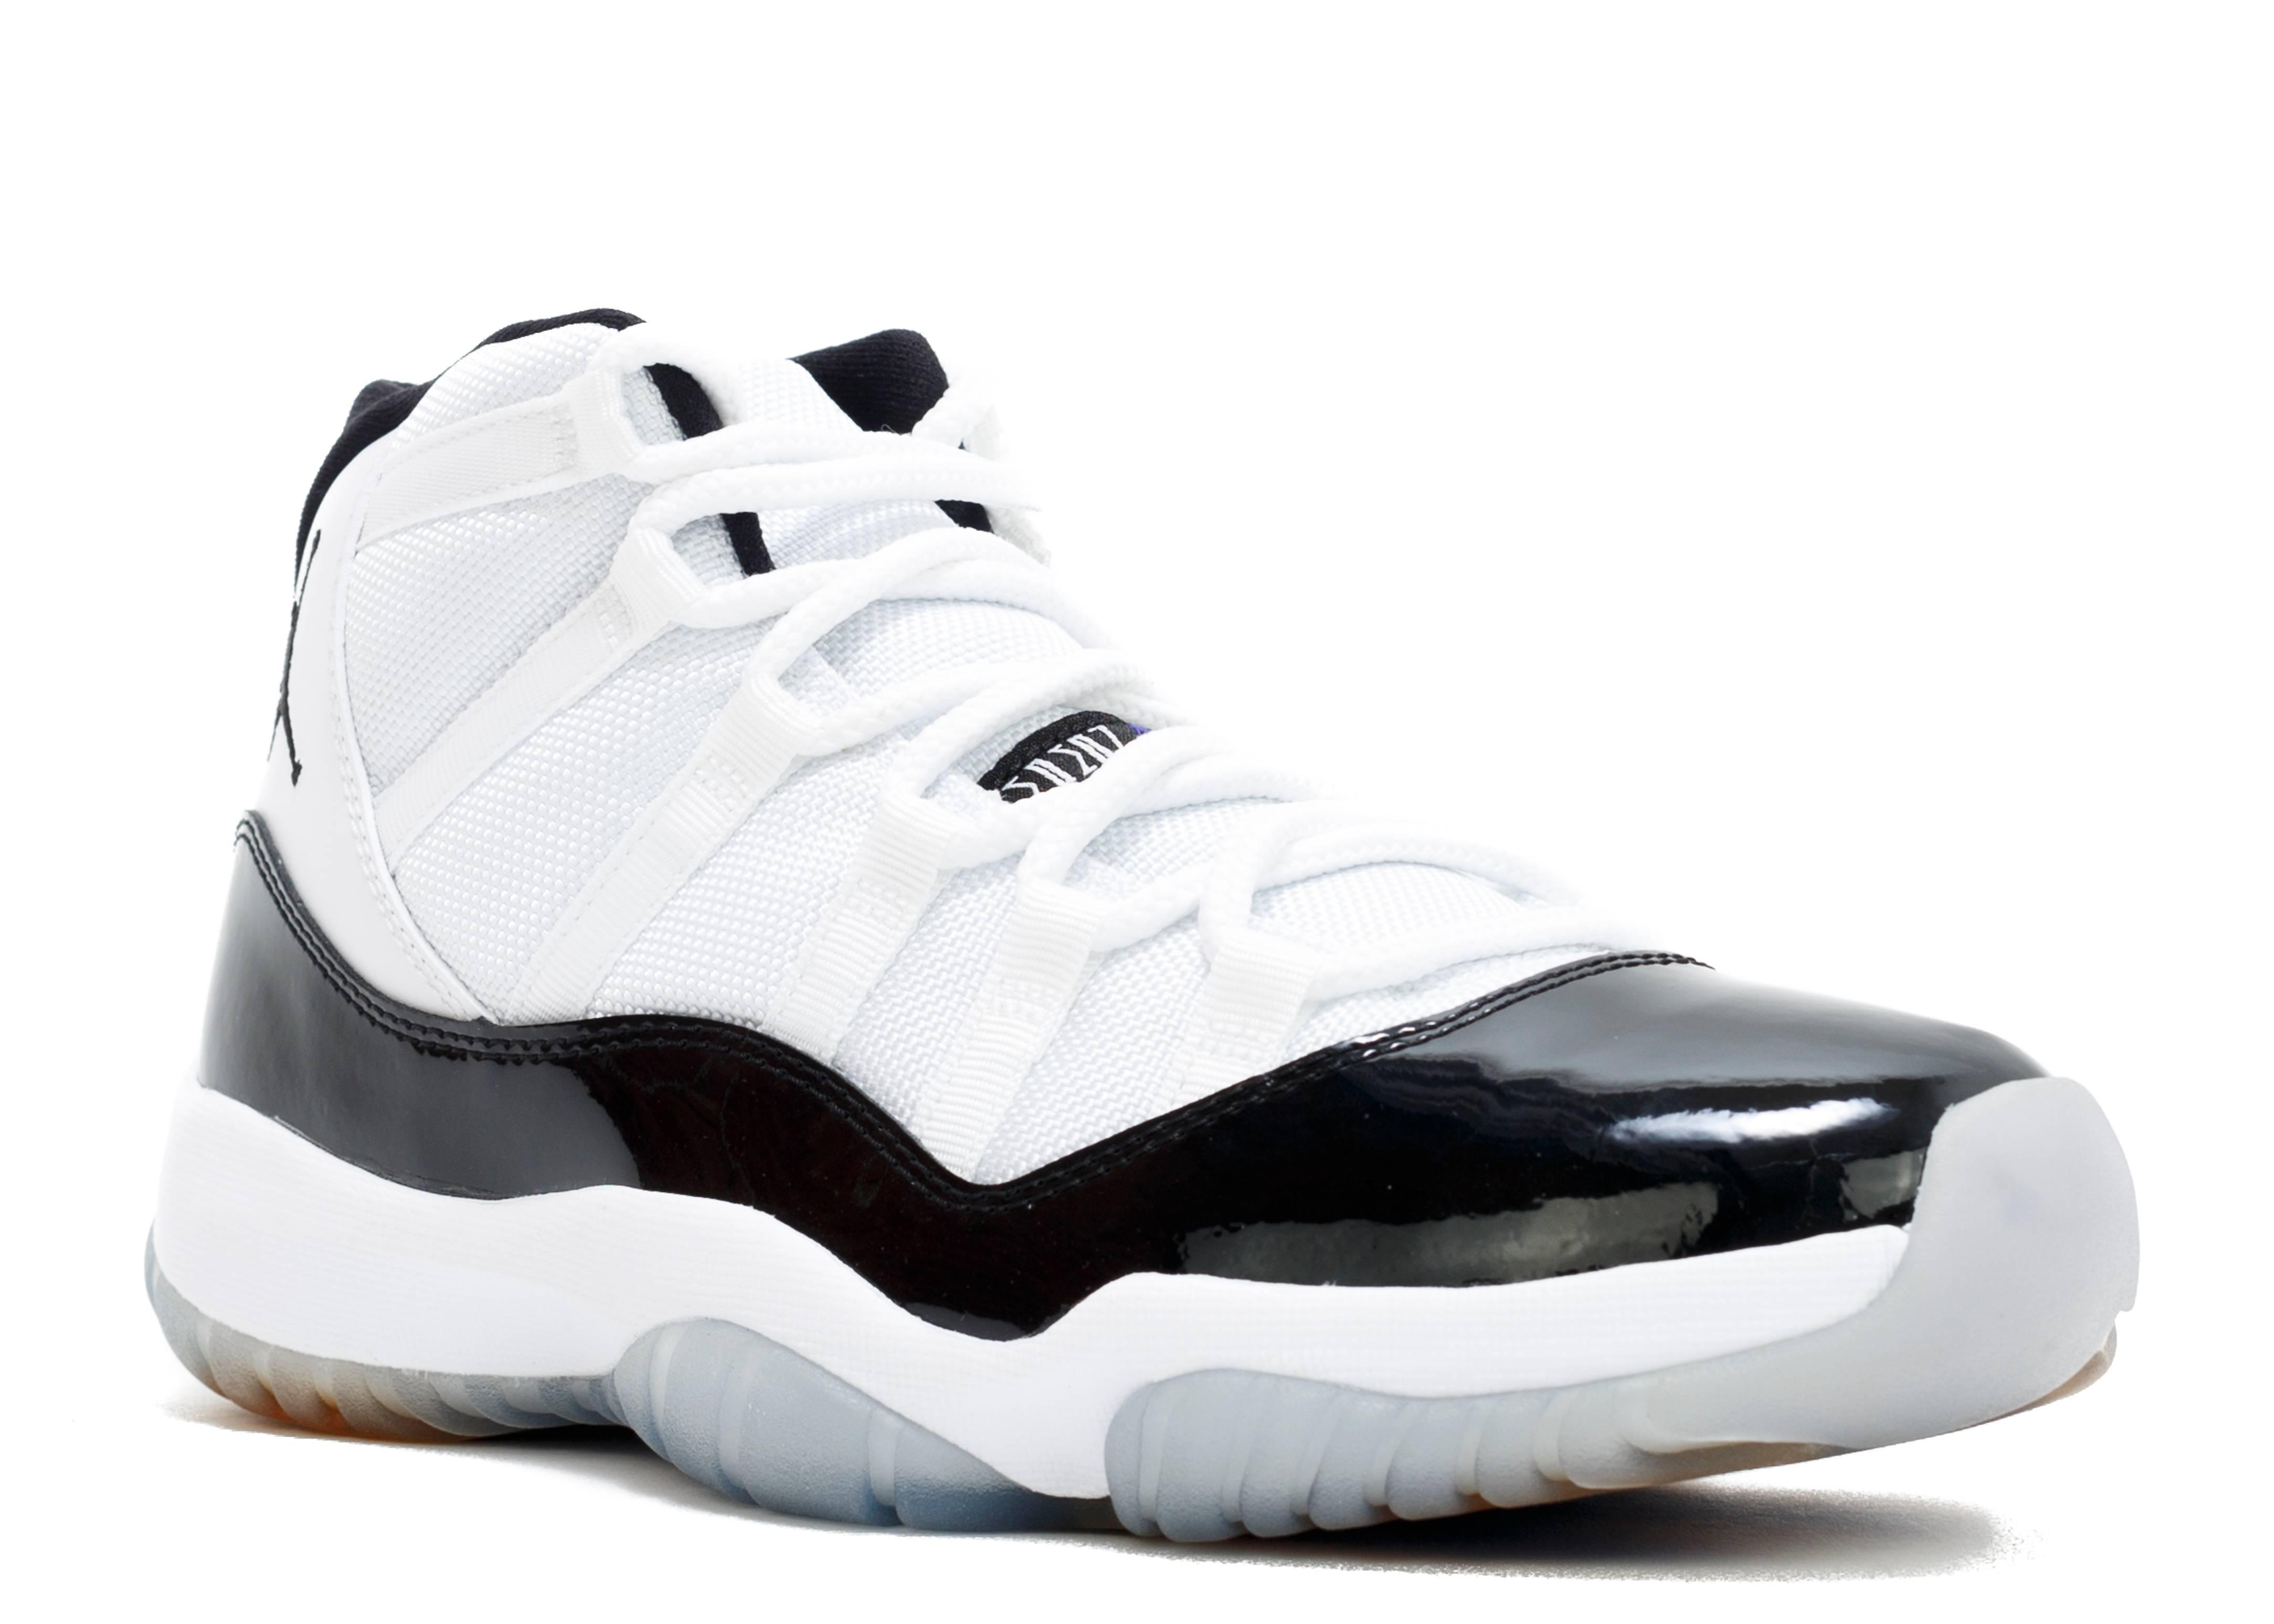 separation shoes 87c0b 2ea17 basket air jordan 11 retro concords